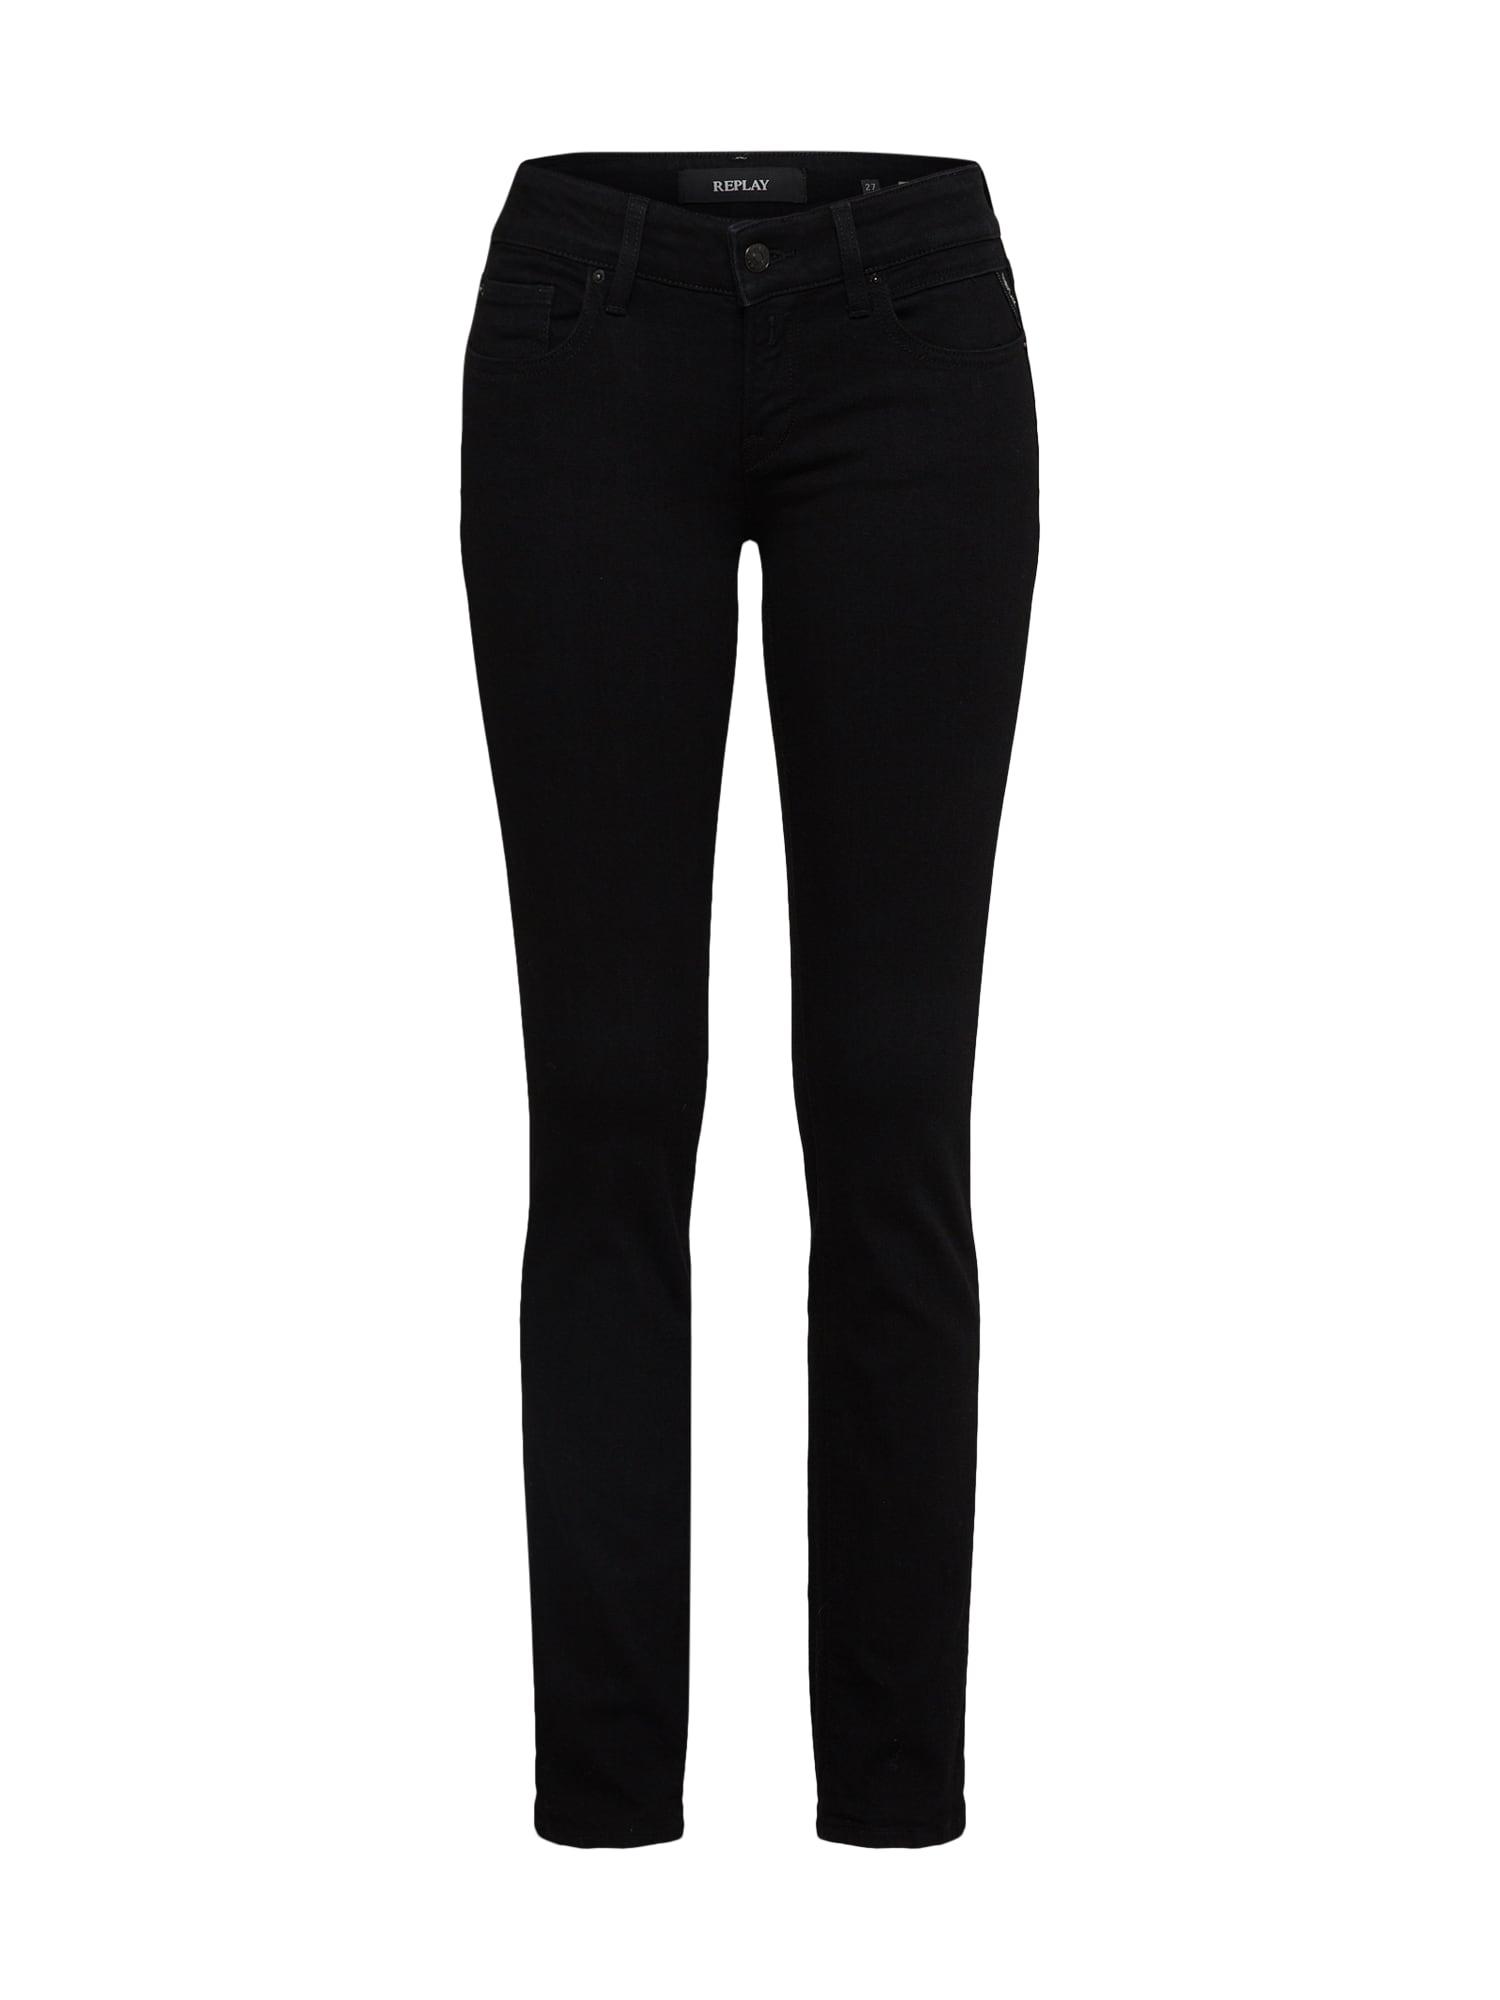 REPLAY Dames Jeans Vicki black denim